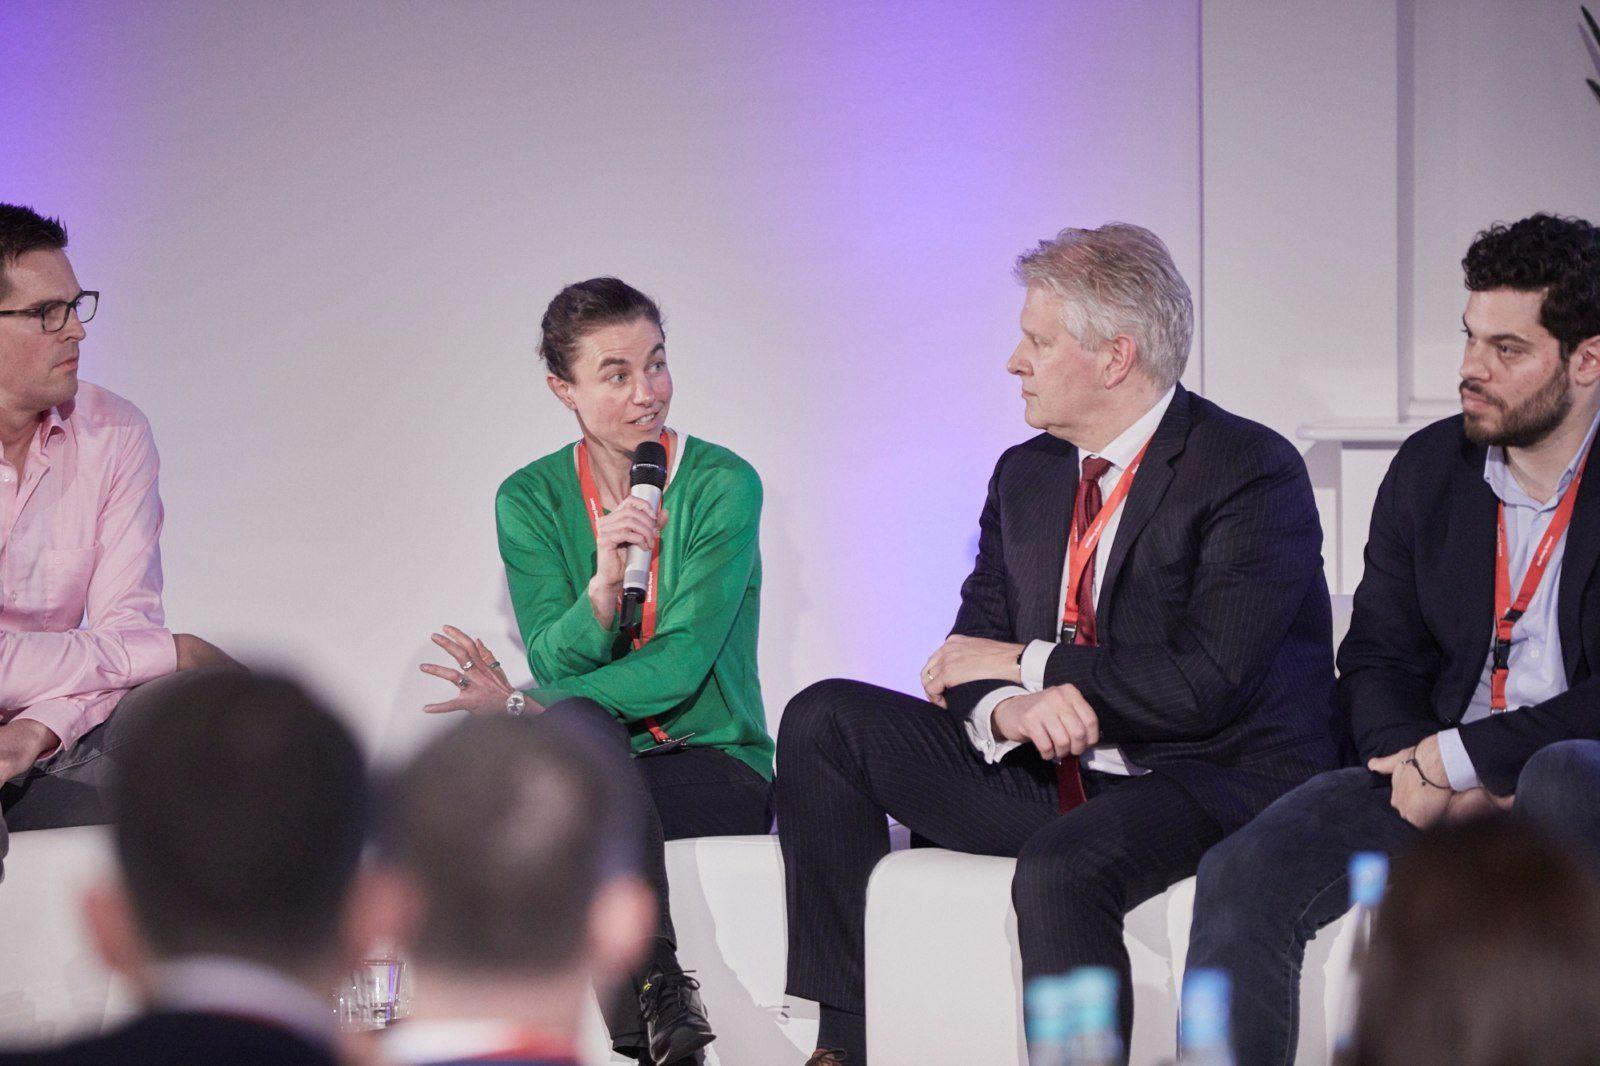 Guest Speaker: Simone van Neerven, Head of Innovation at Vueling Airlines